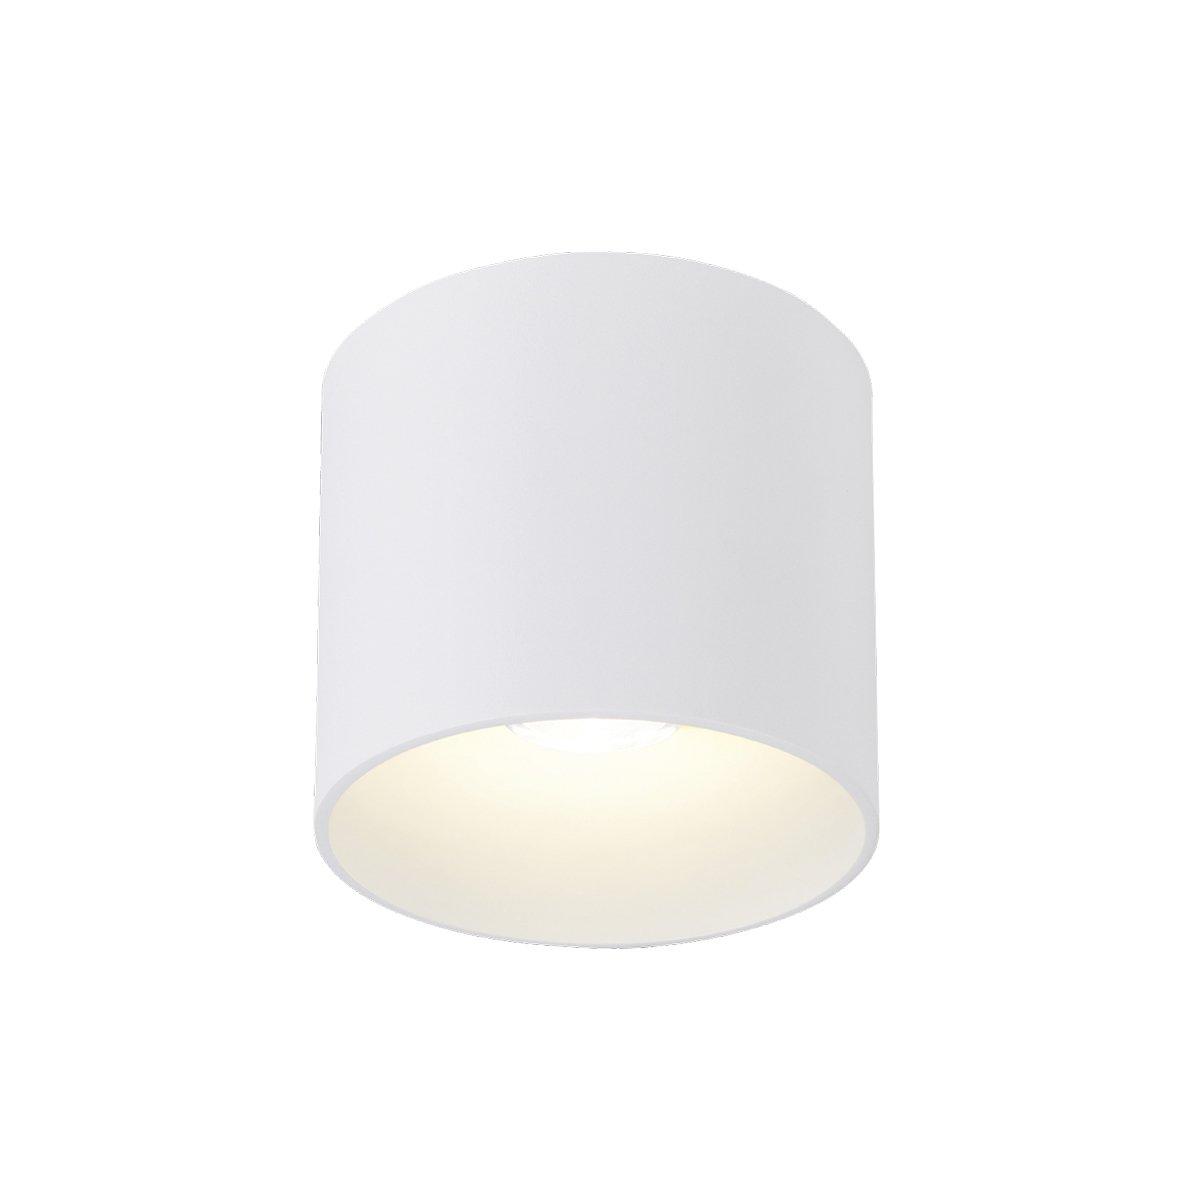 Wever & Ducr� Ray Outdoor Plafondlamp